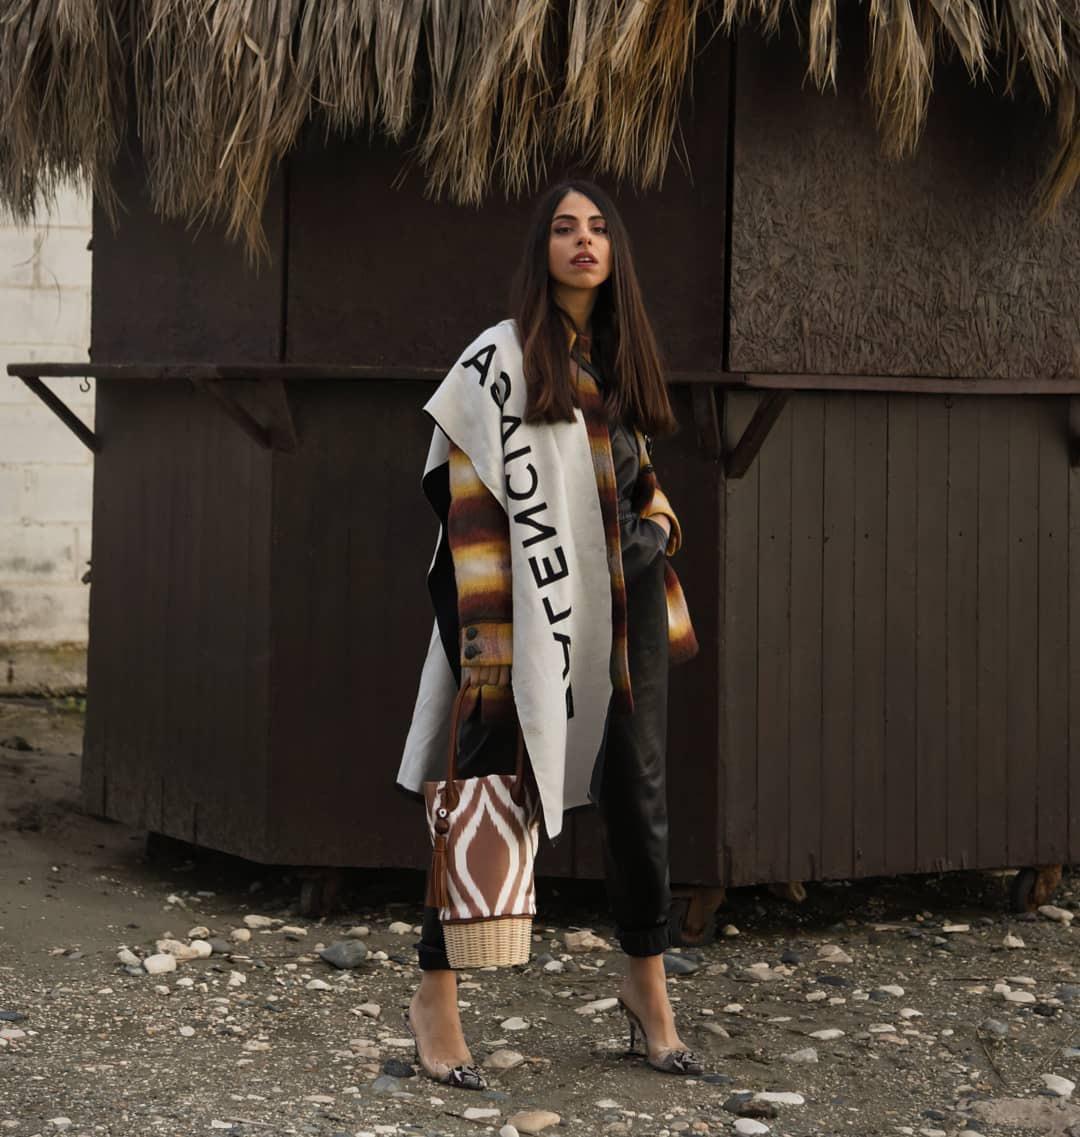 scarf balenciaga plaid coat pumps handbag black jumpsuit leather